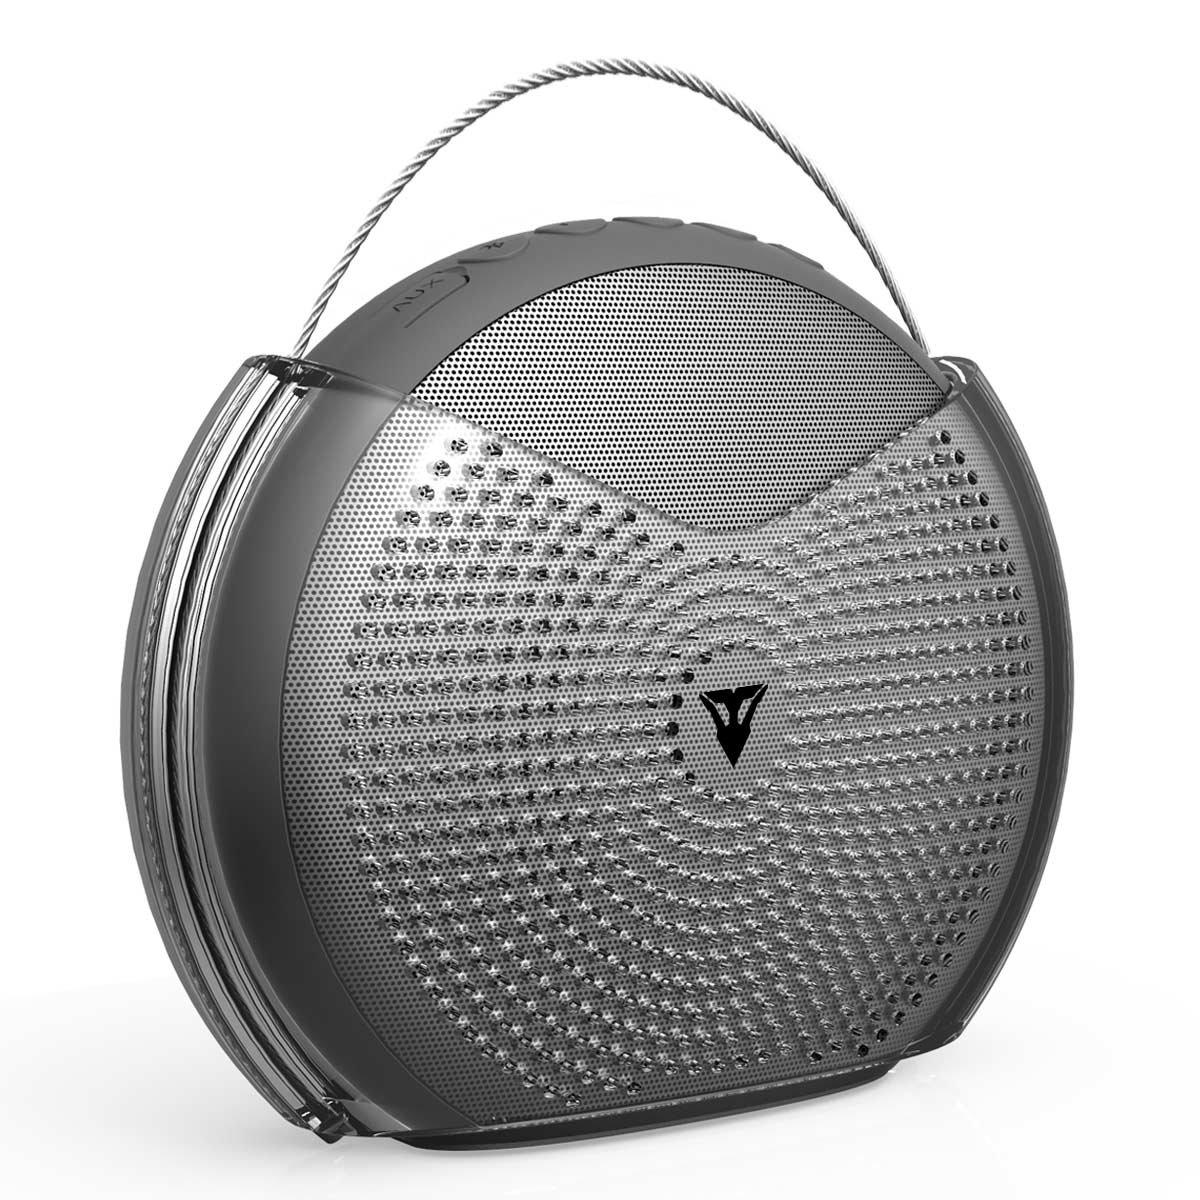 Vantrue 24 Hours Wireless Portable Bluetooth Speaker with 25W Loud Volume Dual Driver, Bluetooth V4.2, Enhanced Bass, Crisp highs, Built-in Mic for Beach, Home, Outdoor, Shower Splashproof